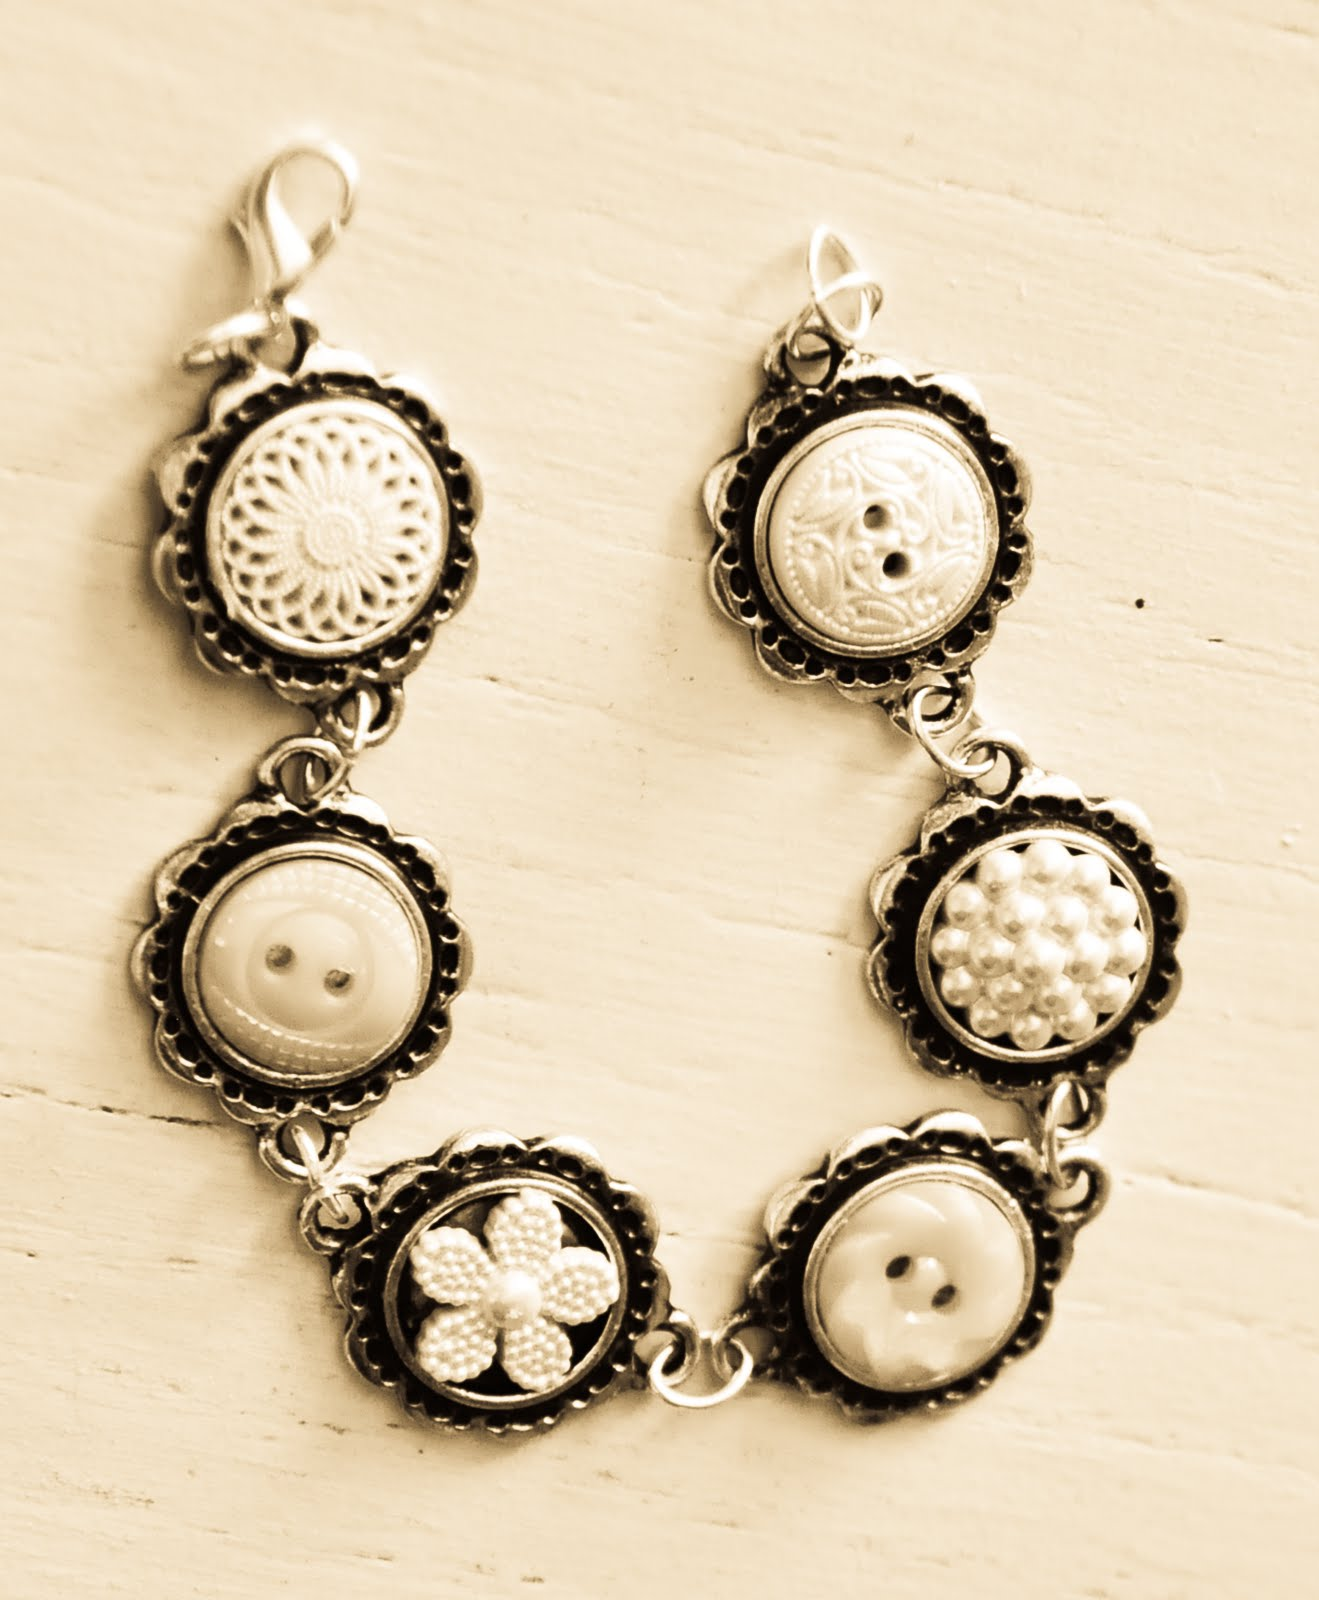 Speak this button jewelry vintage not necessary